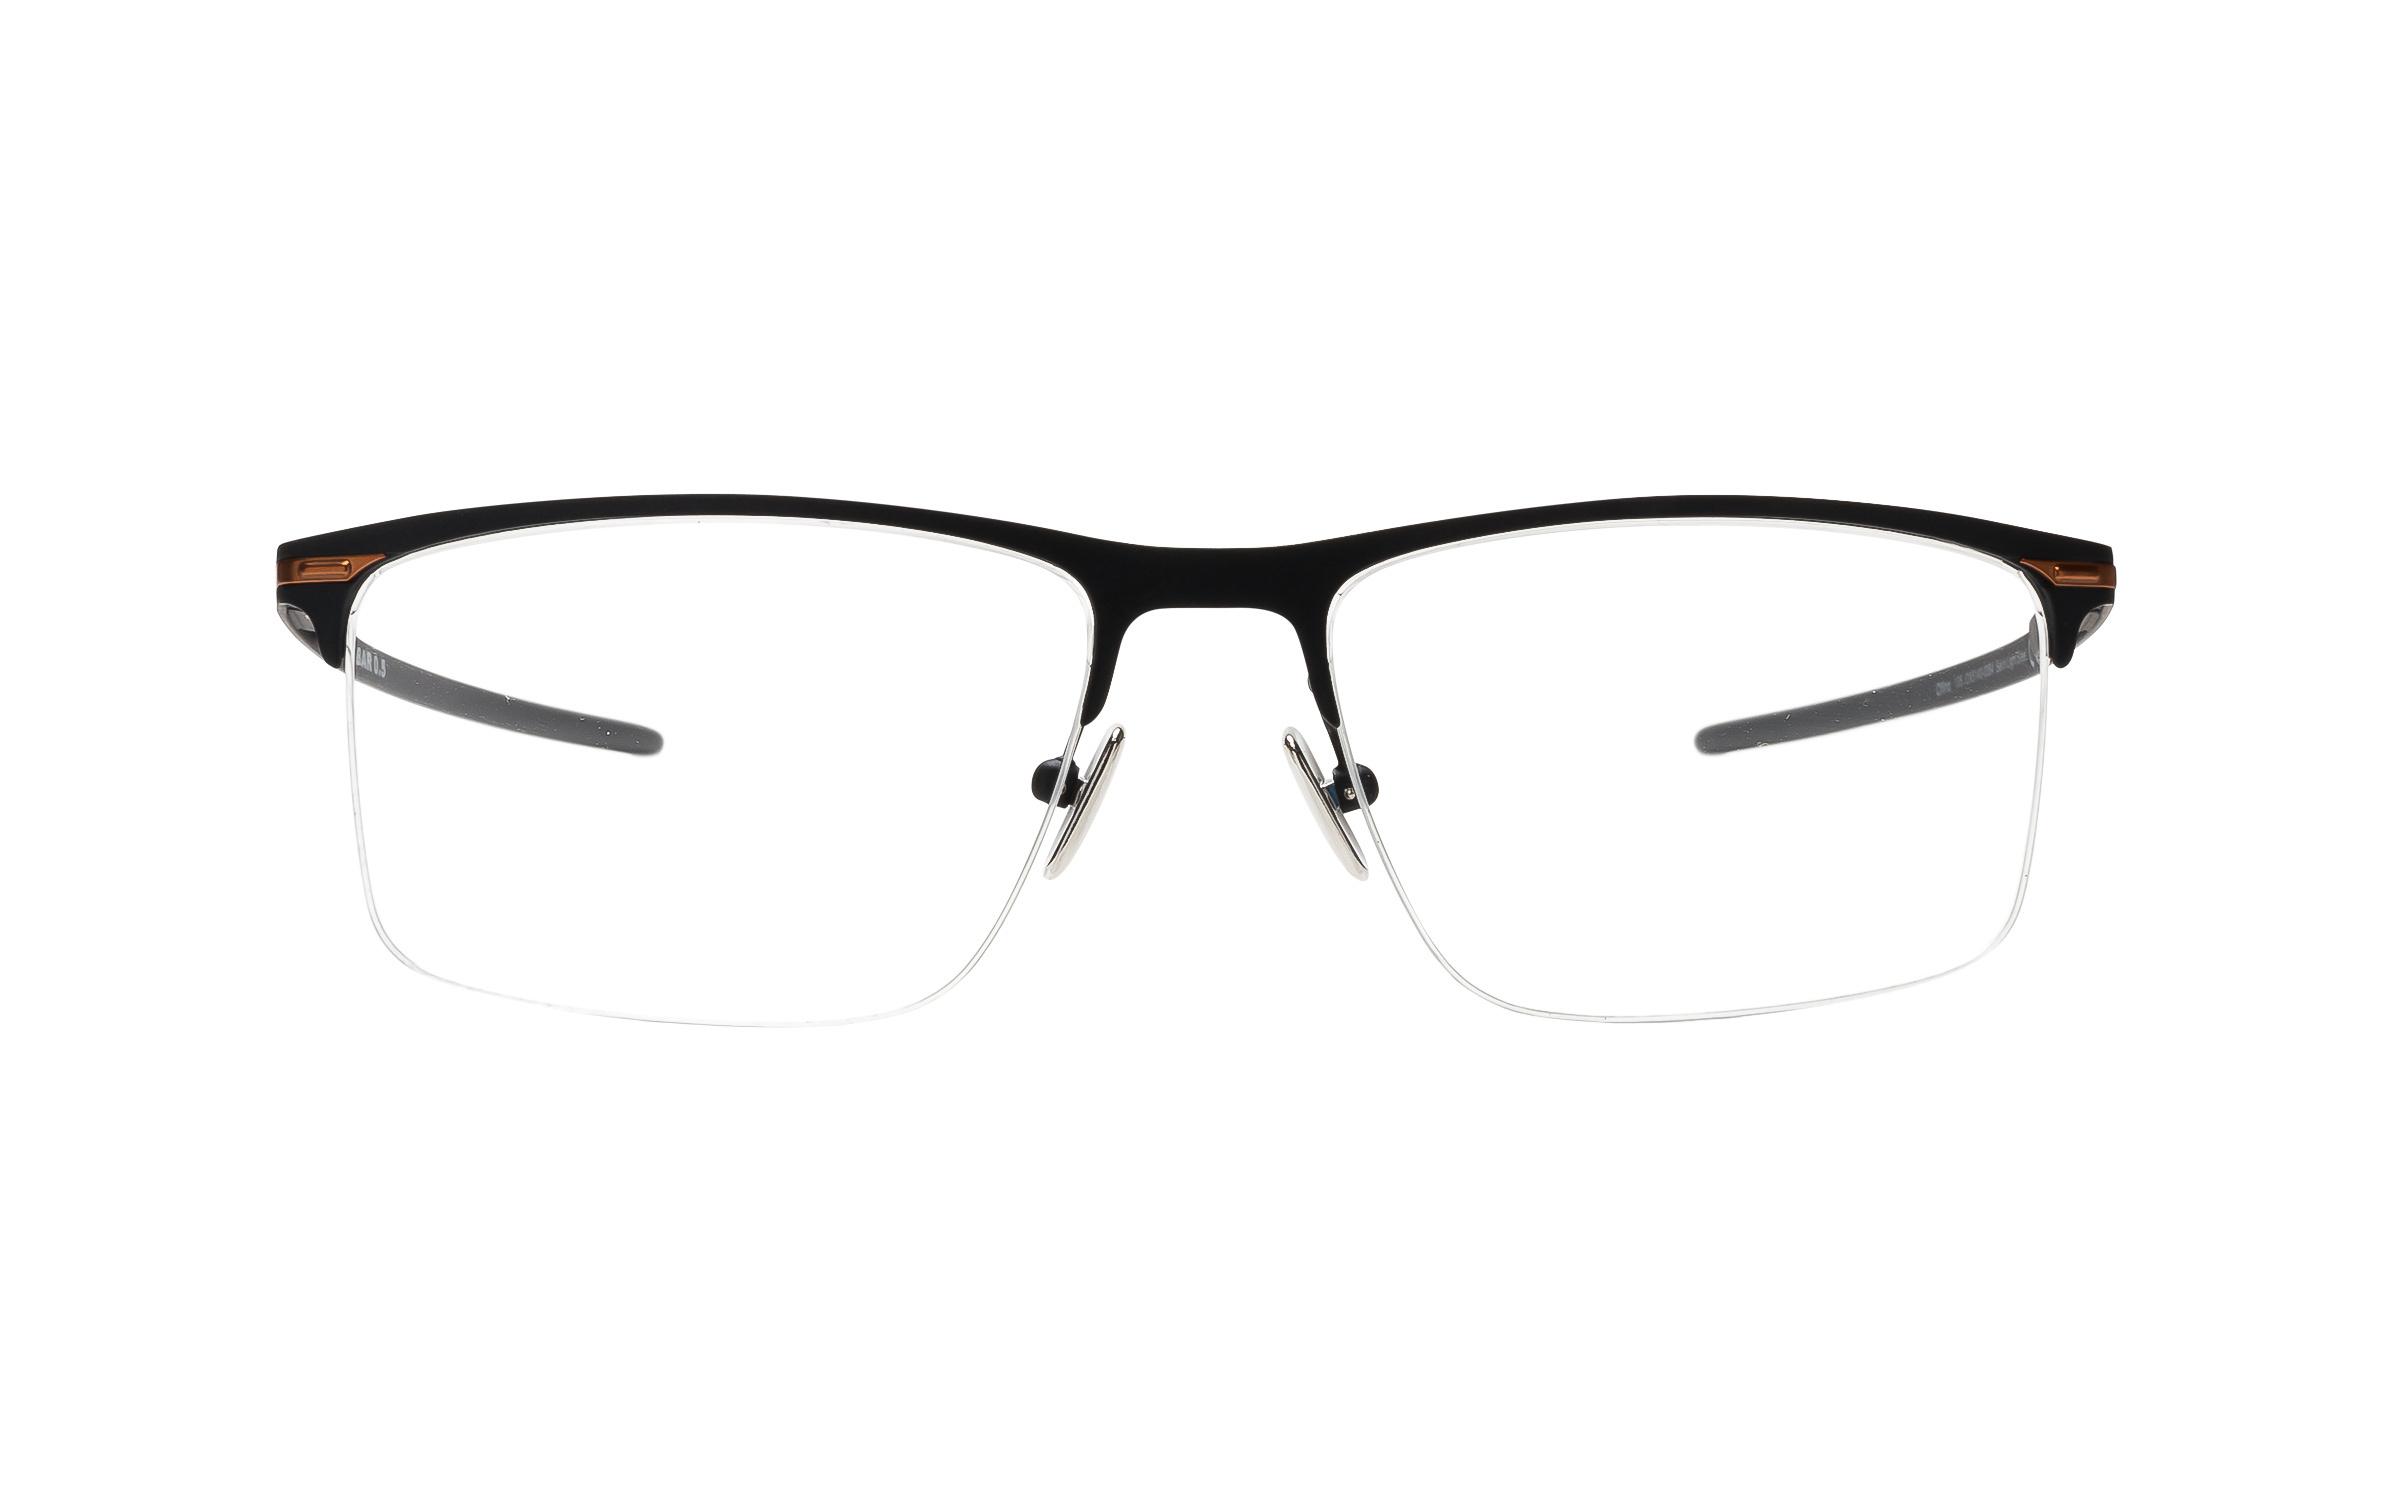 Luxottica Oakley Tie Bar 0.5 OX5140 0354 (54) Eyeglasses and Frame in Satin Light Steel Black | Plastic/Metal - Online Coastal